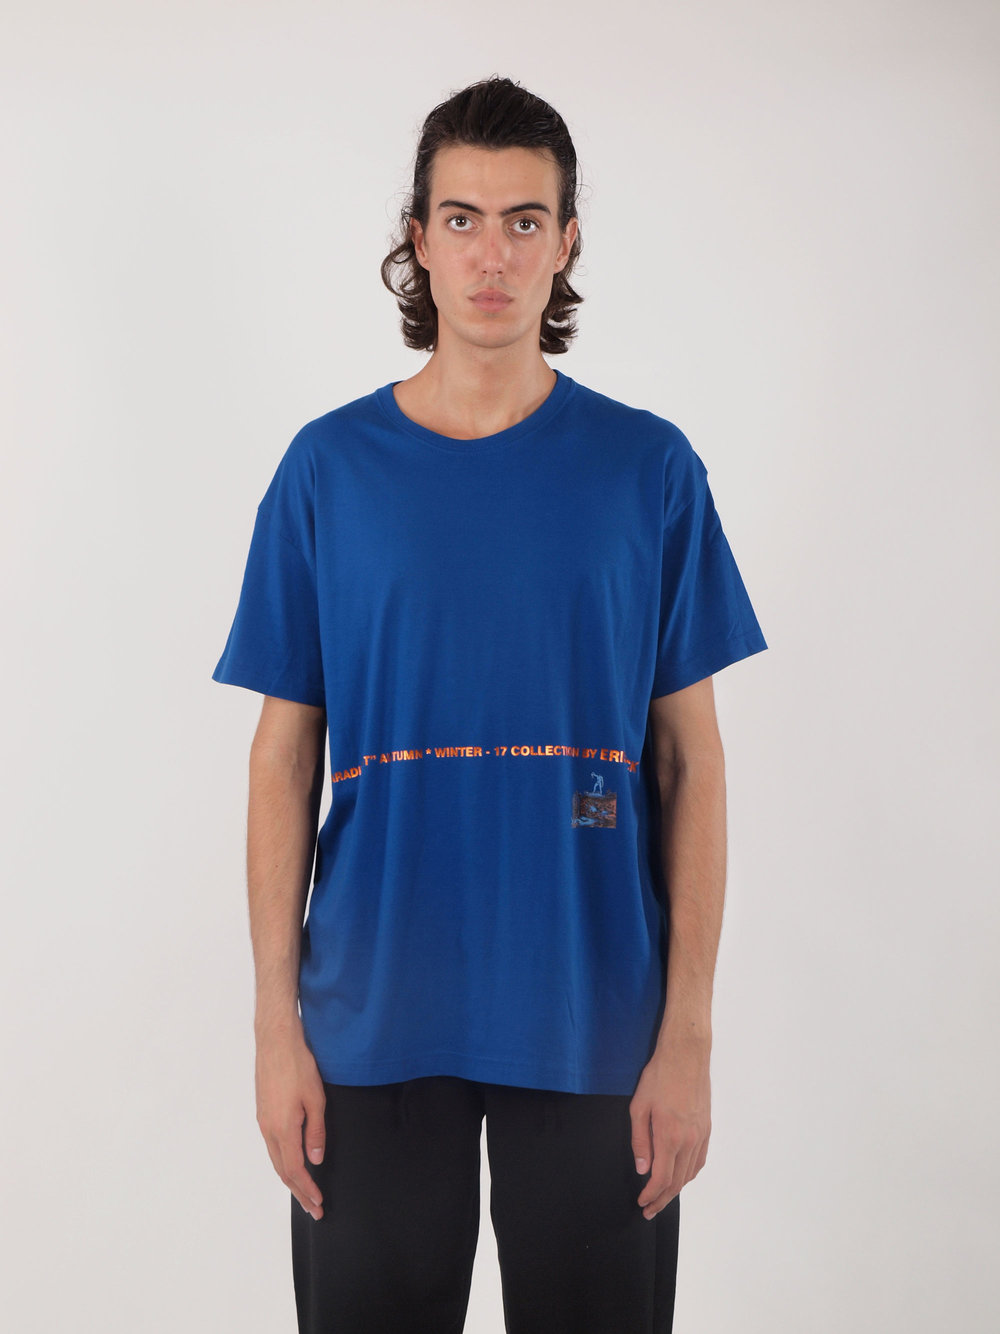 blue-pl-t.jpg